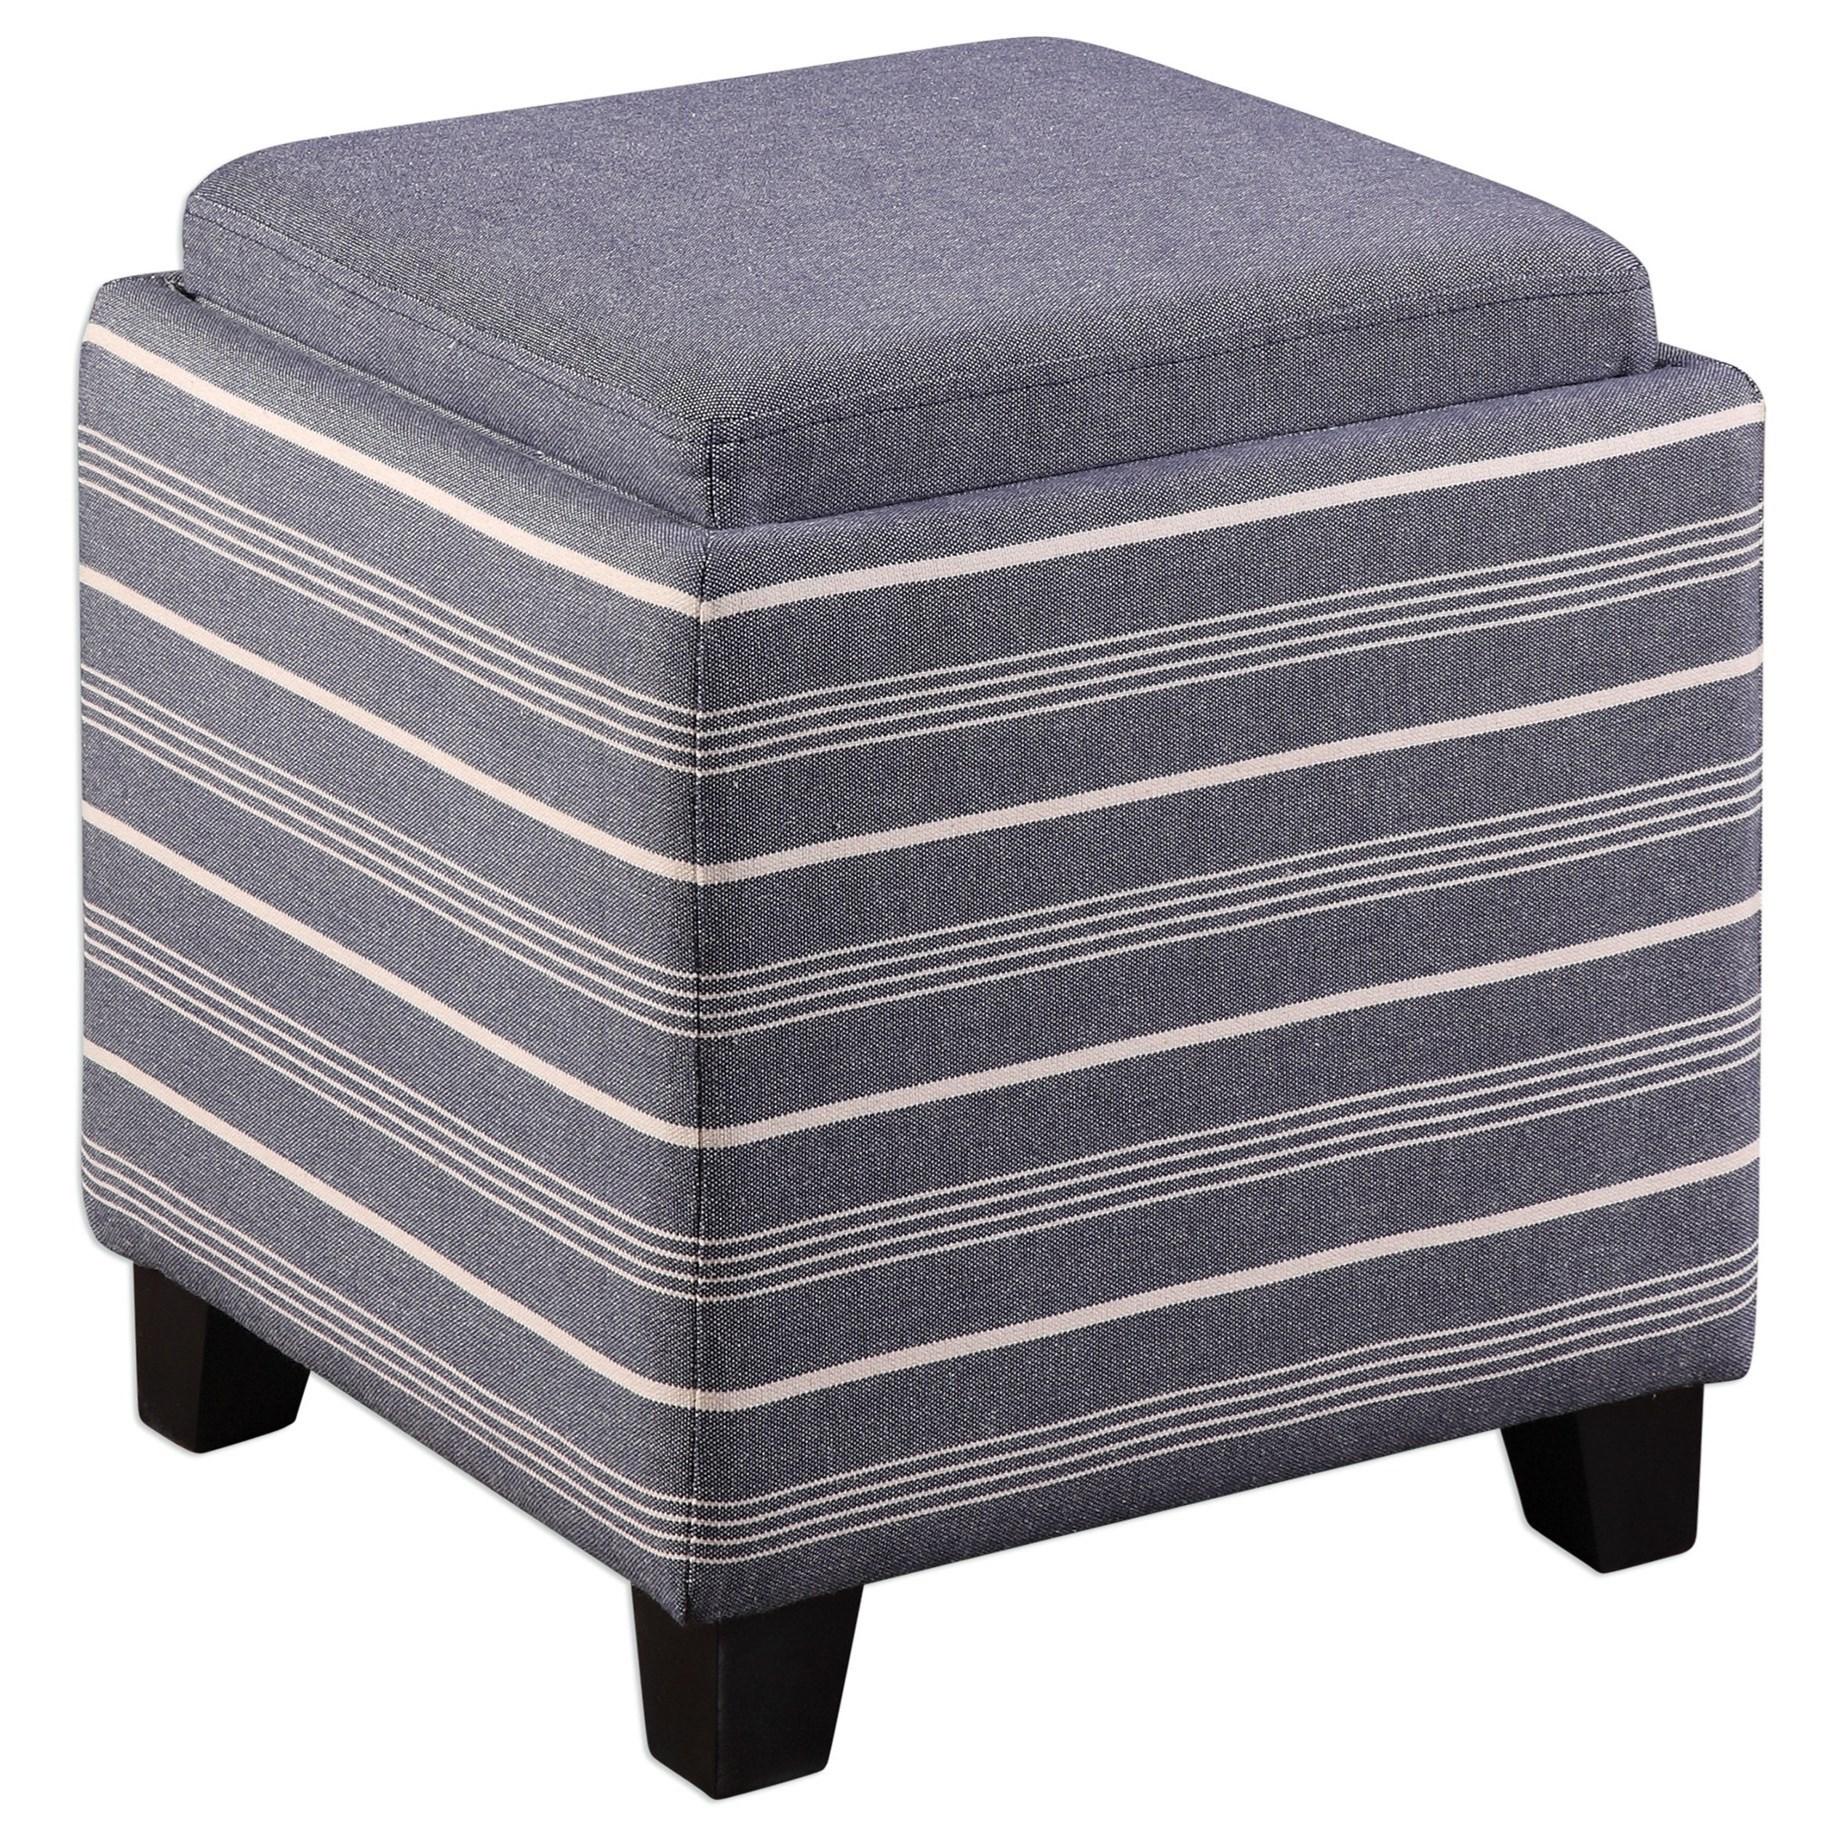 Uttermost Accent Furniture Lewis Storage Ottoman - Item Number: 23320